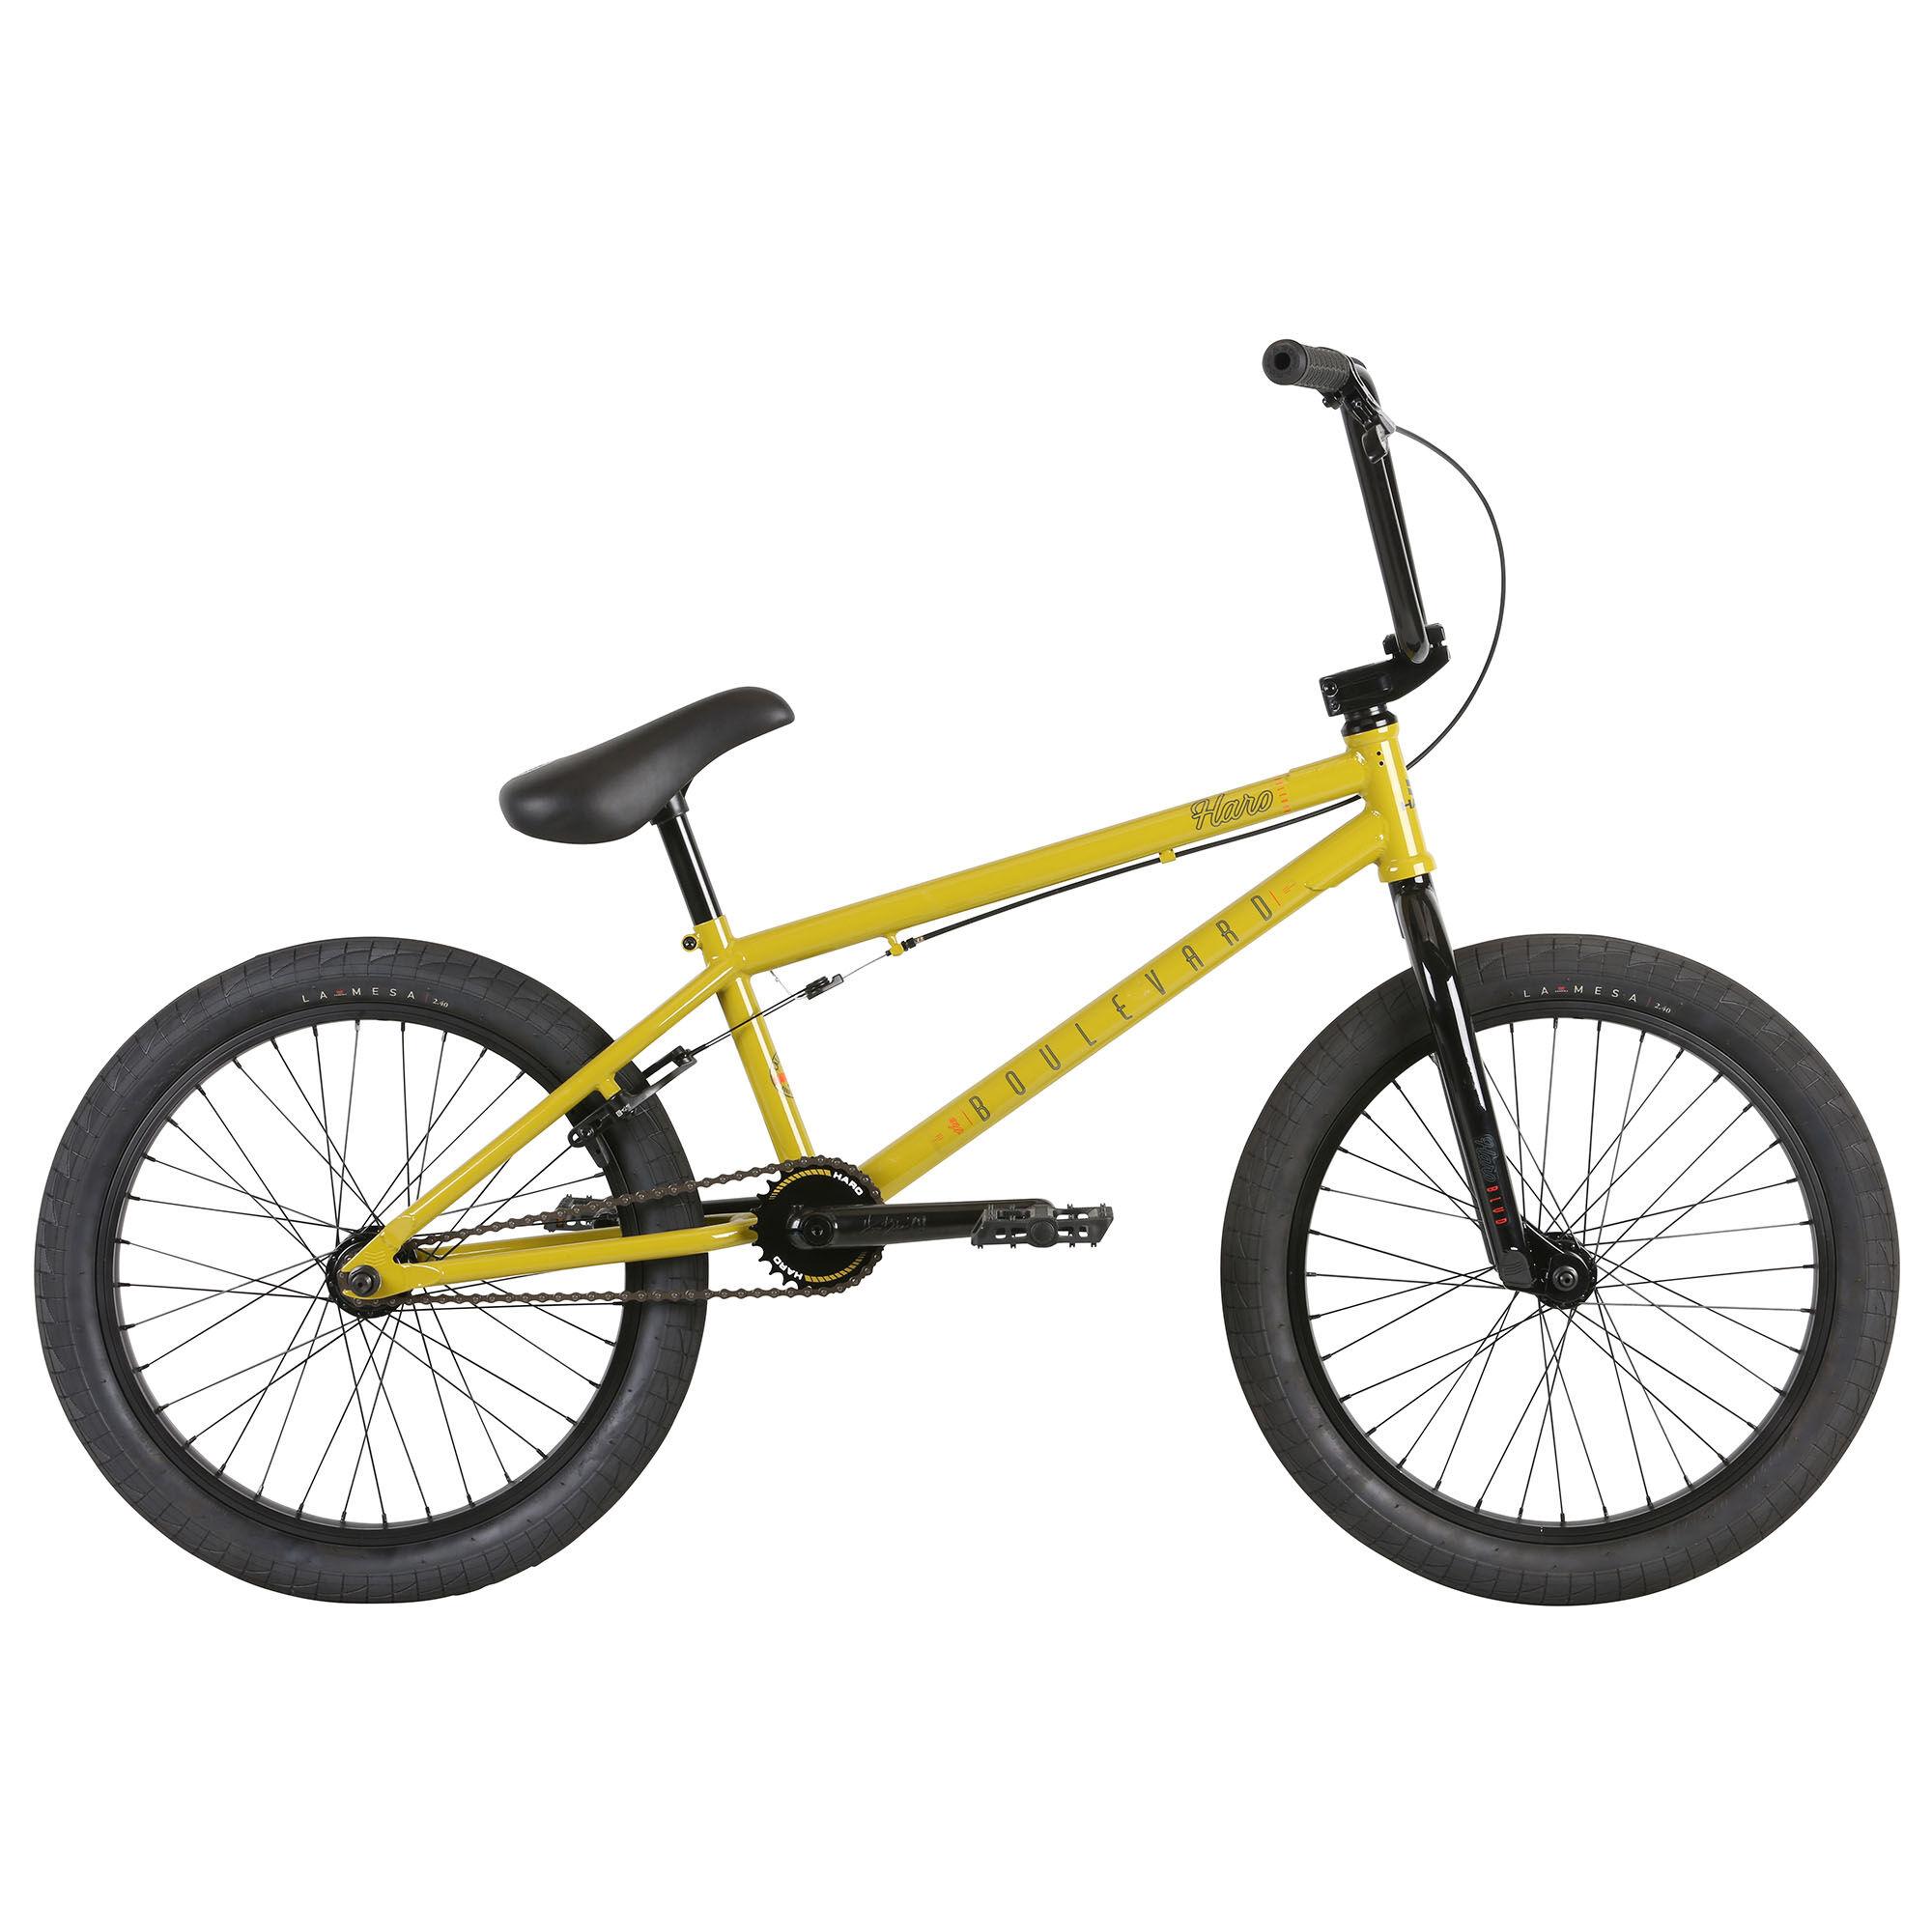 Haro Boulevard 20.75 BMX Bike '21  - Matte Black - Size: 20.75